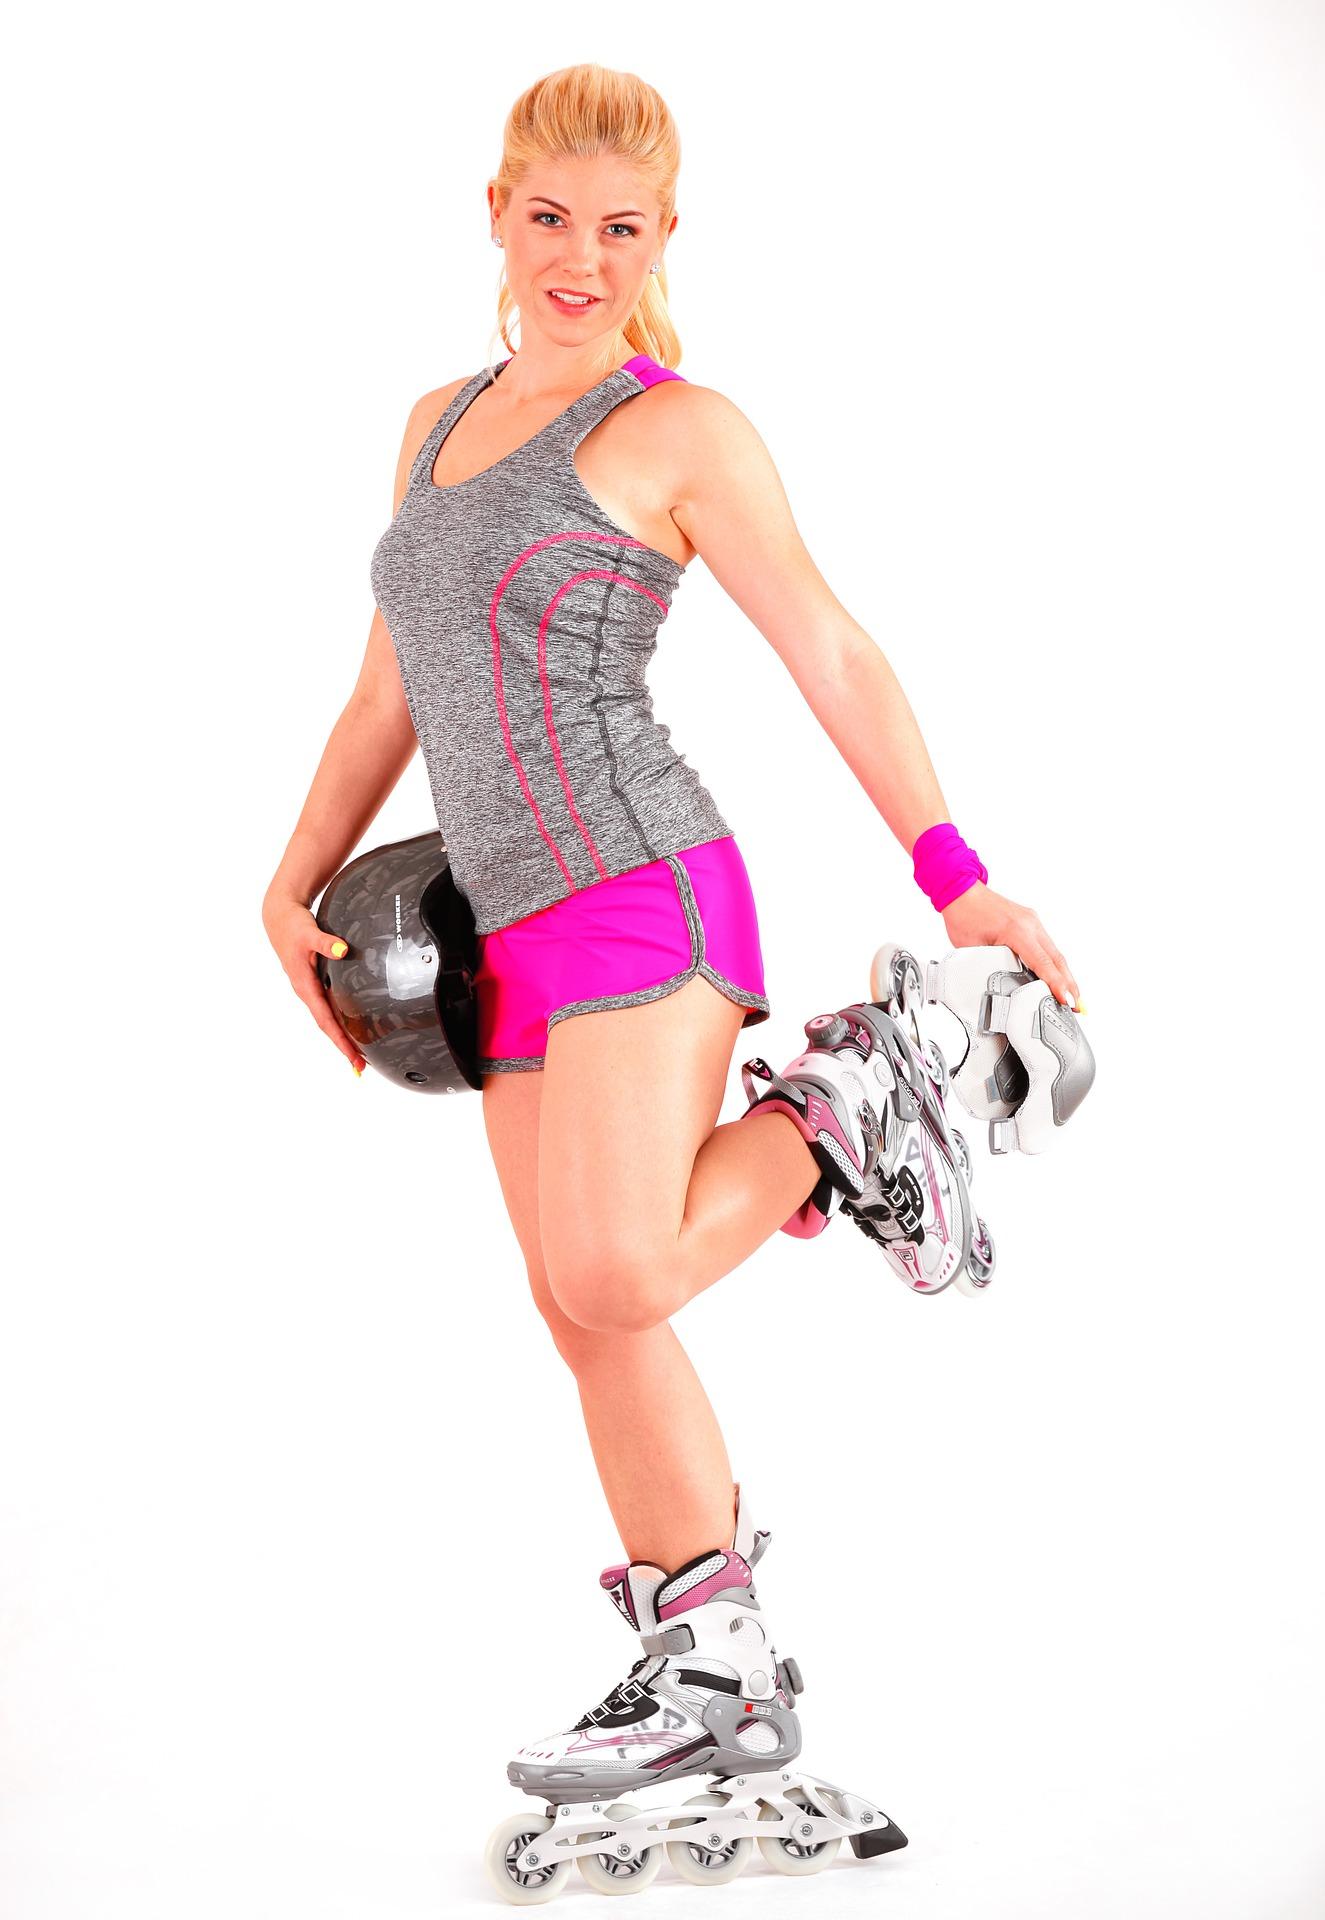 Partnersuche fitness Διαρρηξη πορτας αυτοκινητου